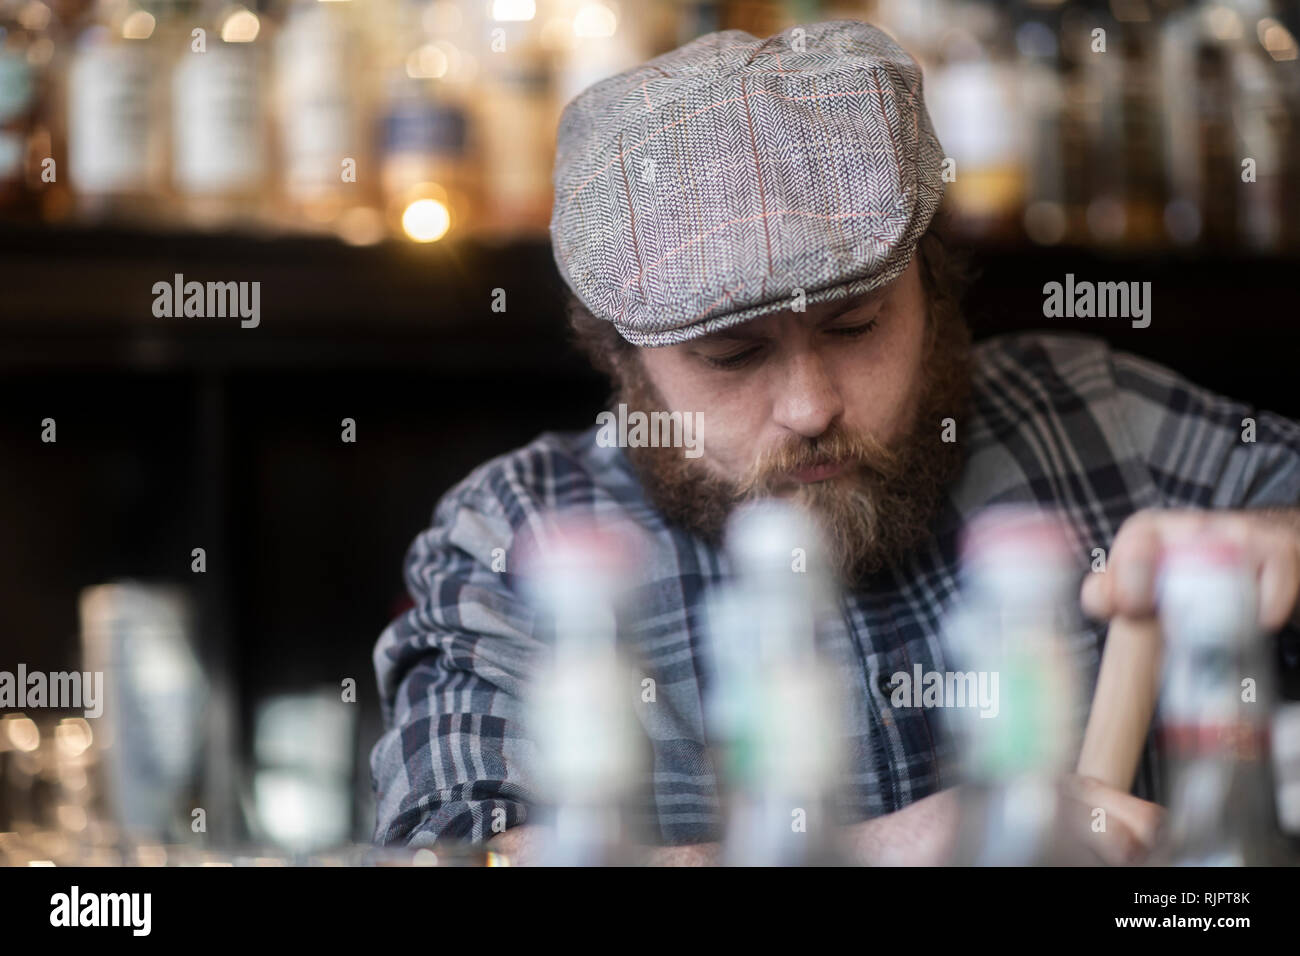 Barman working behind bar in traditional Irish public house - Stock Image